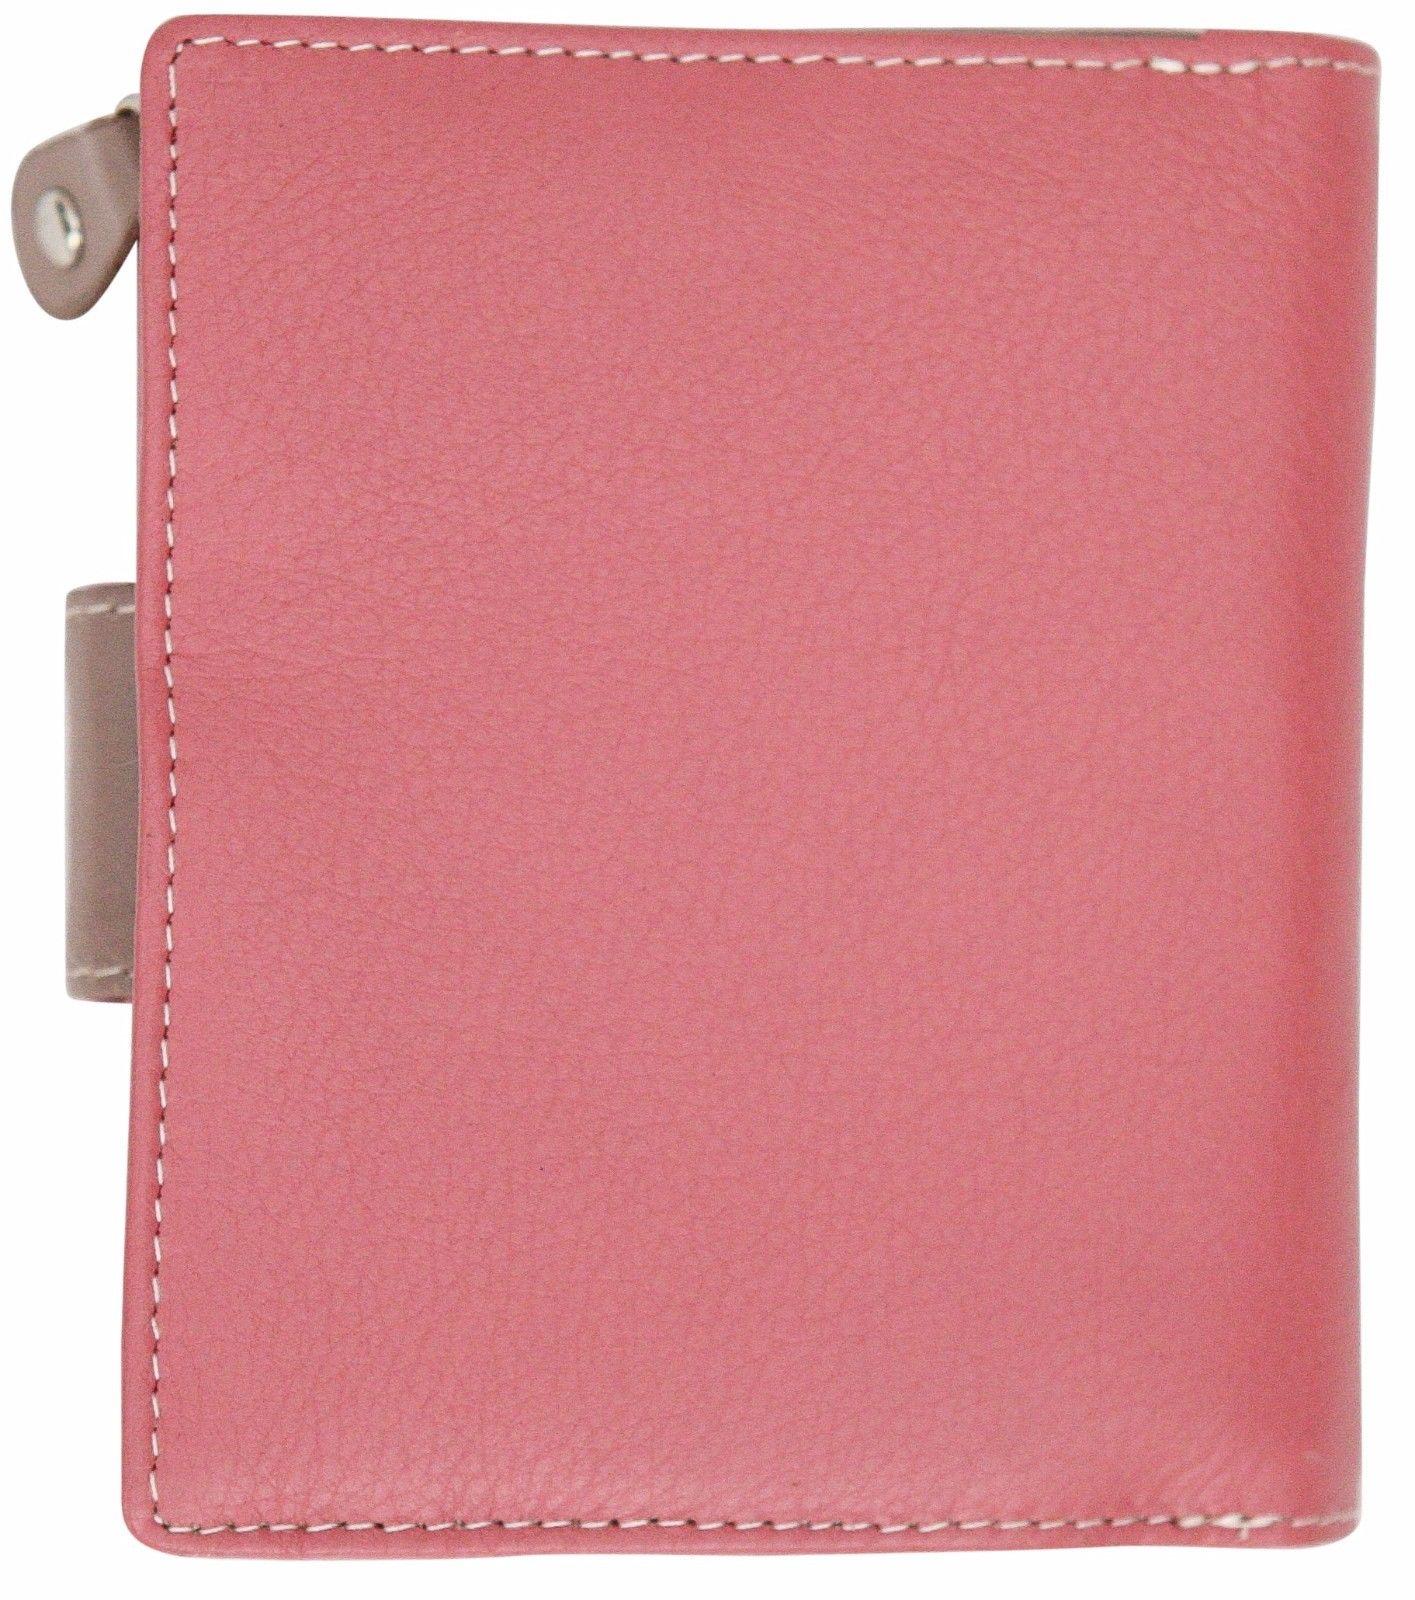 Felda-RFID-onorevoli-MEDAGLIA-amp-Card-Purse-Wallet-Genuine-Leather-Multi-SOFT-BOX-REGALO miniatura 91